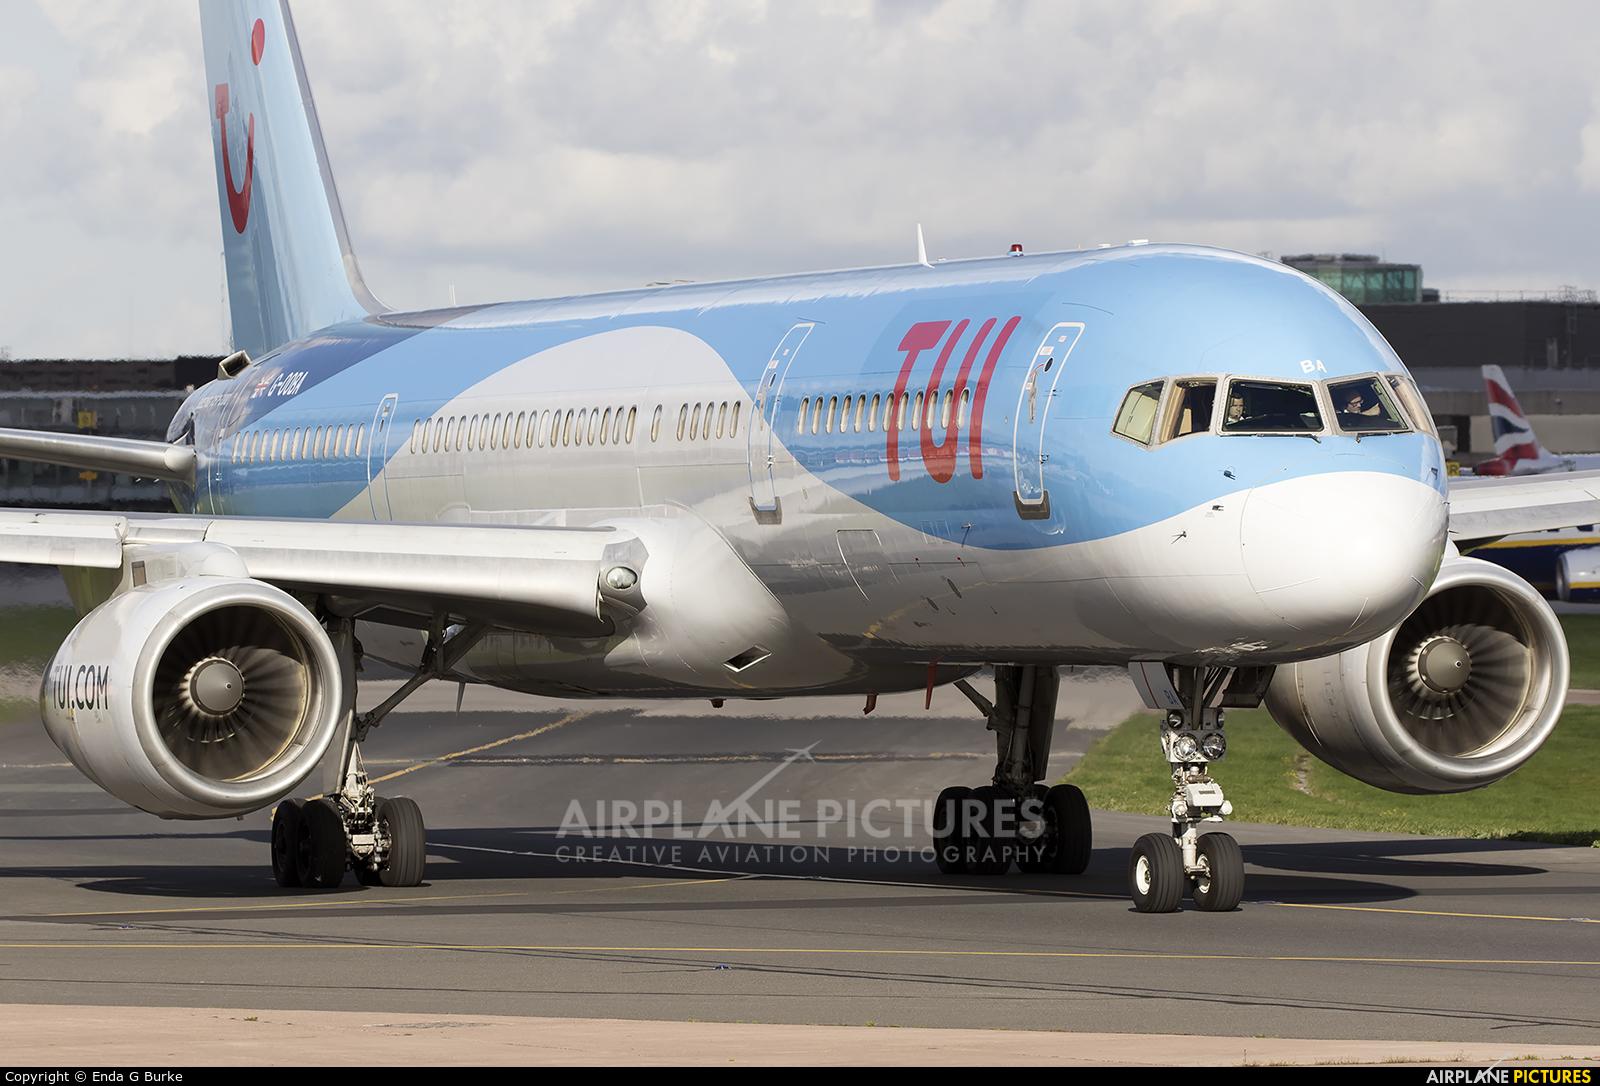 TUI Airways G-OOBA aircraft at Manchester